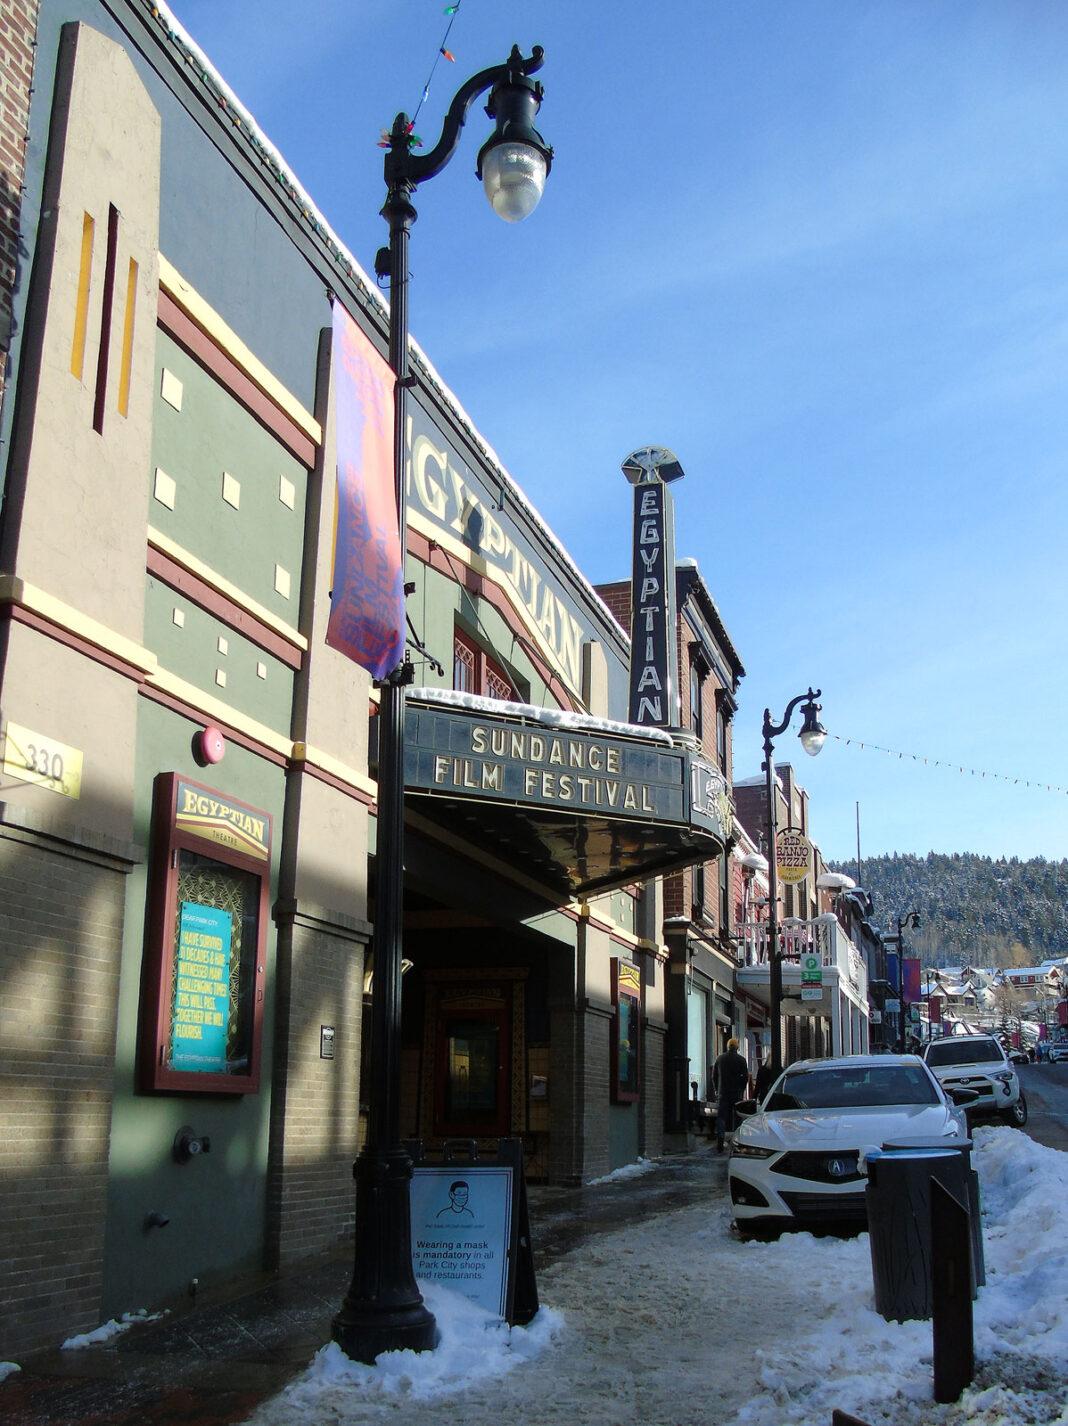 Sundance Film Festival marquee on Egyptian Theatre